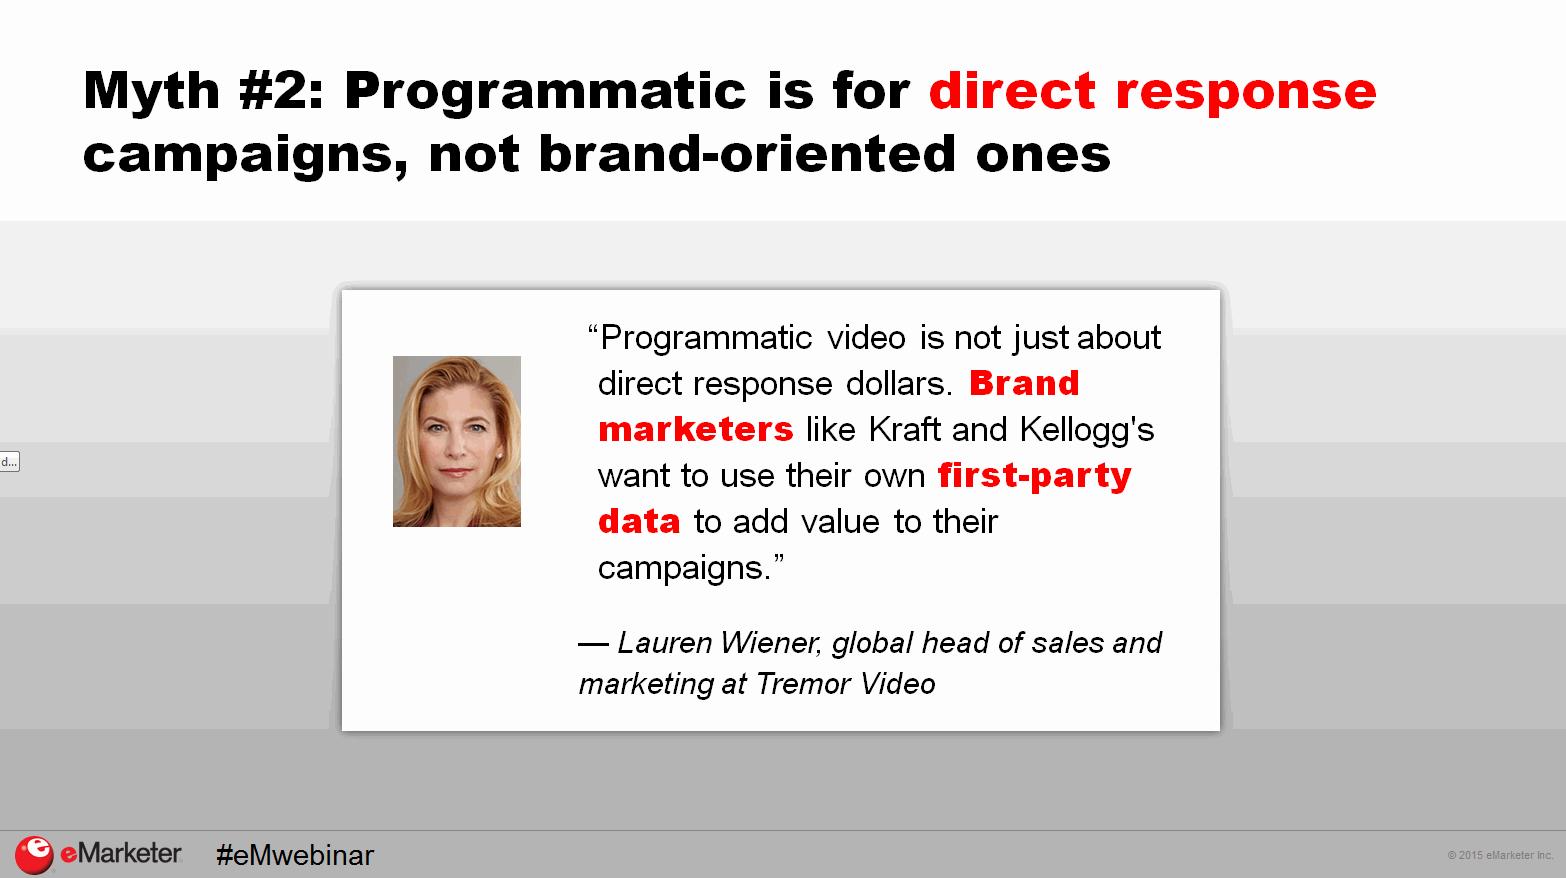 It's a myth that programmatic is only for direct-response ads #eMwebinar http://t.co/bNxMvigi9a